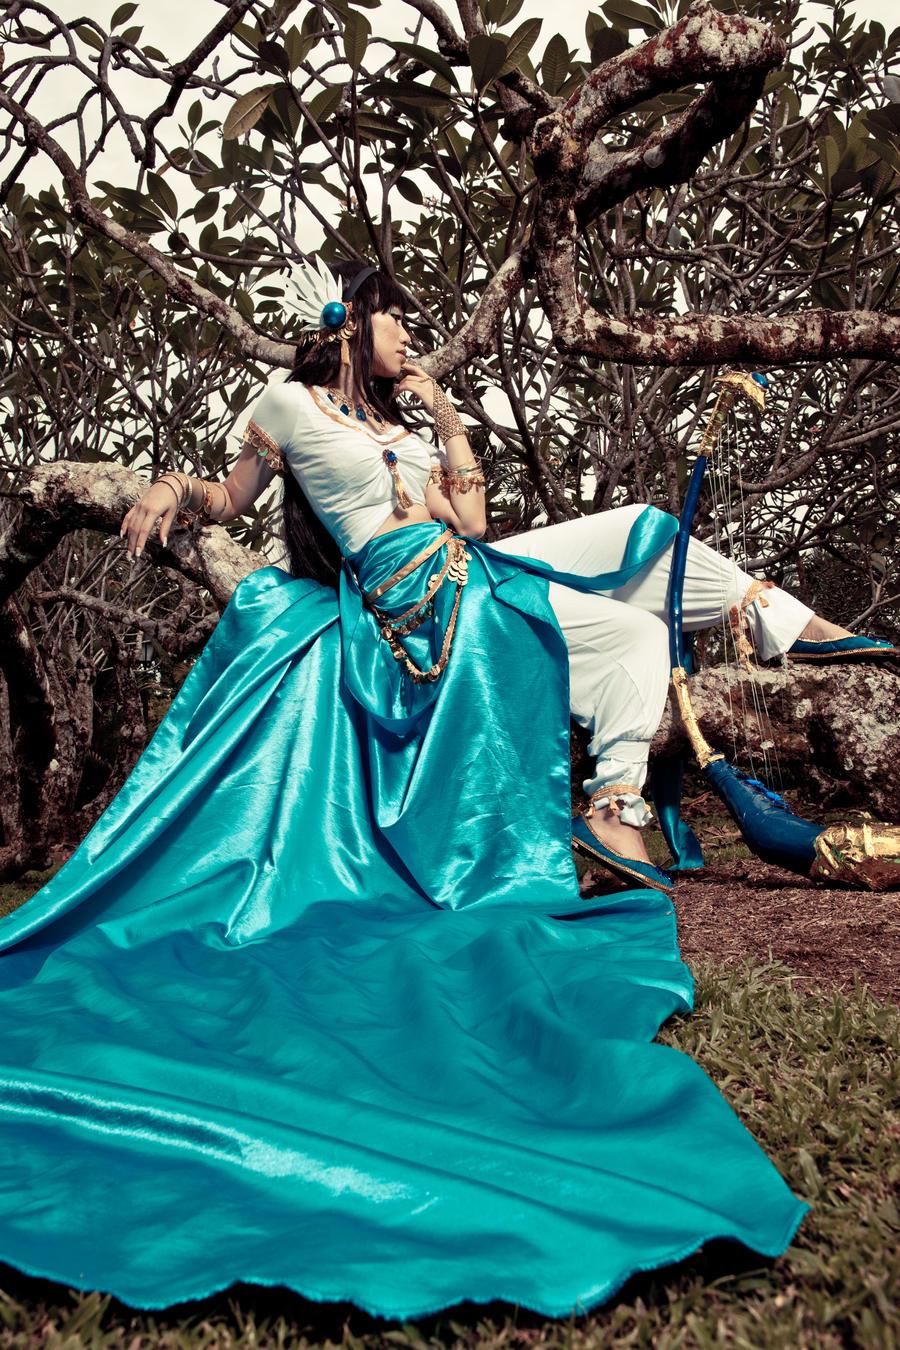 The royal musician 1 - musings by missdeliri